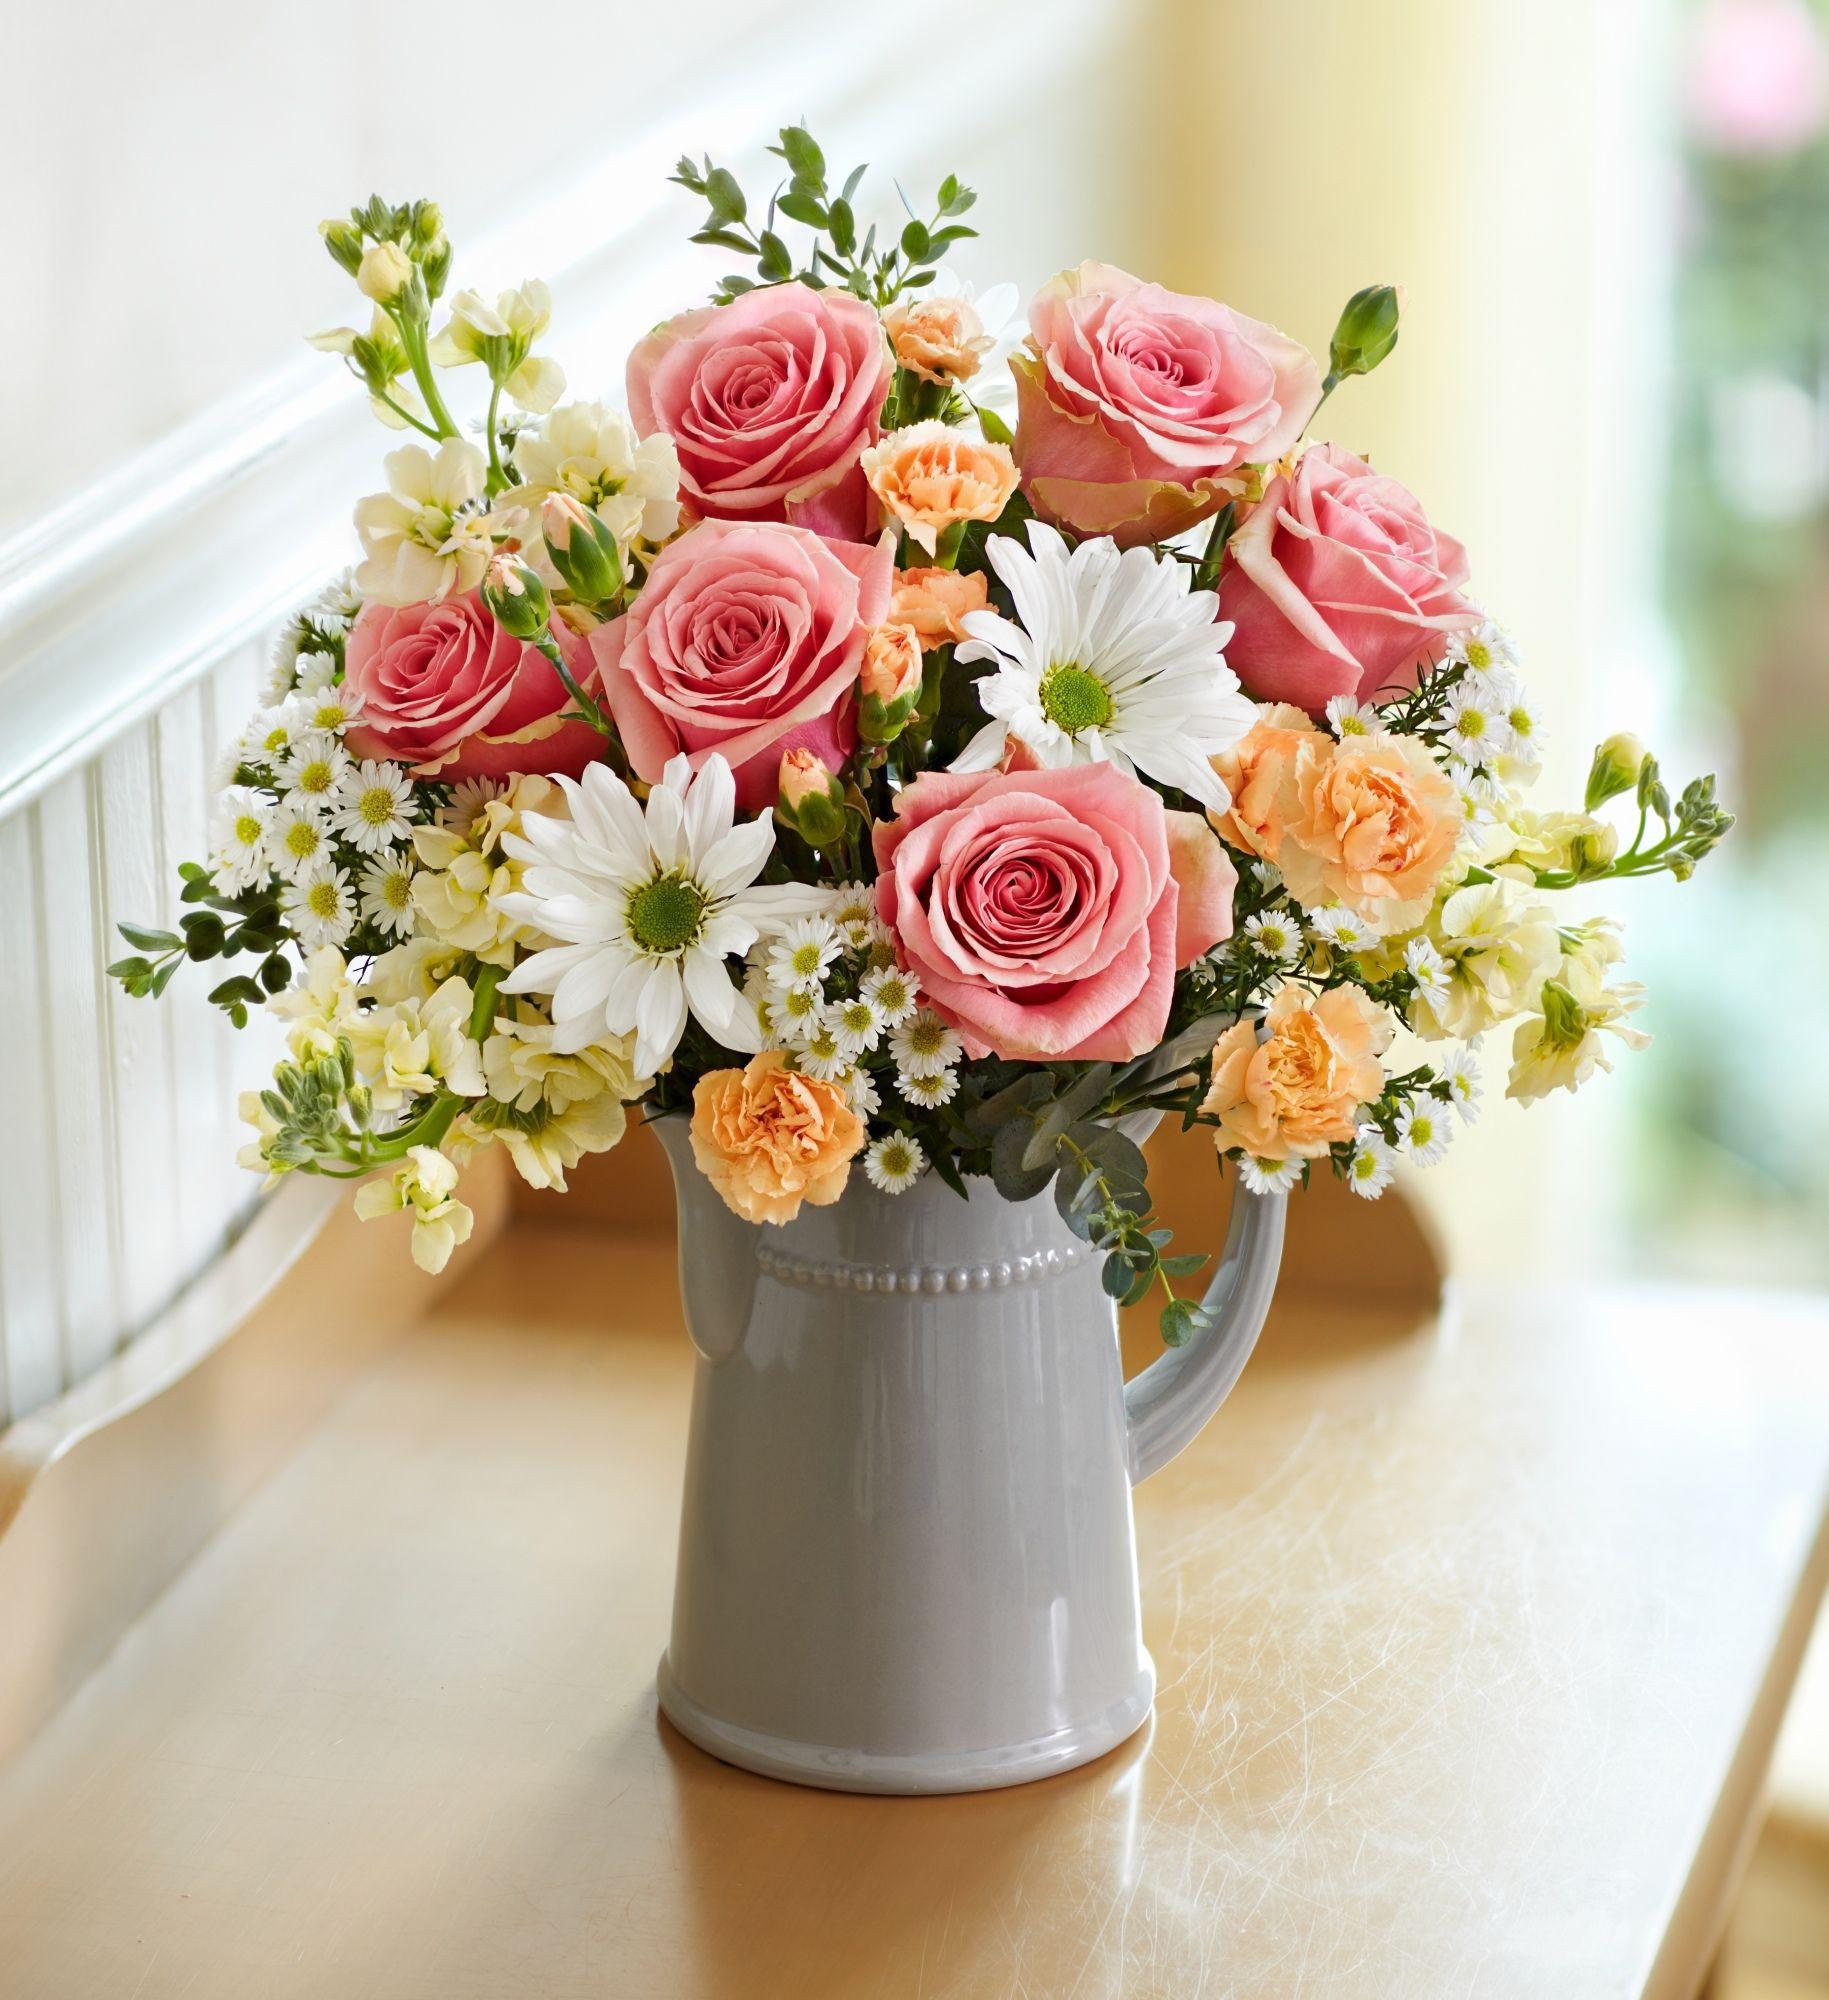 Budaful Flowers Luxury 12 Beautiful Flower Bouquets 12 Gyönyörű Virágcsokor Megaport